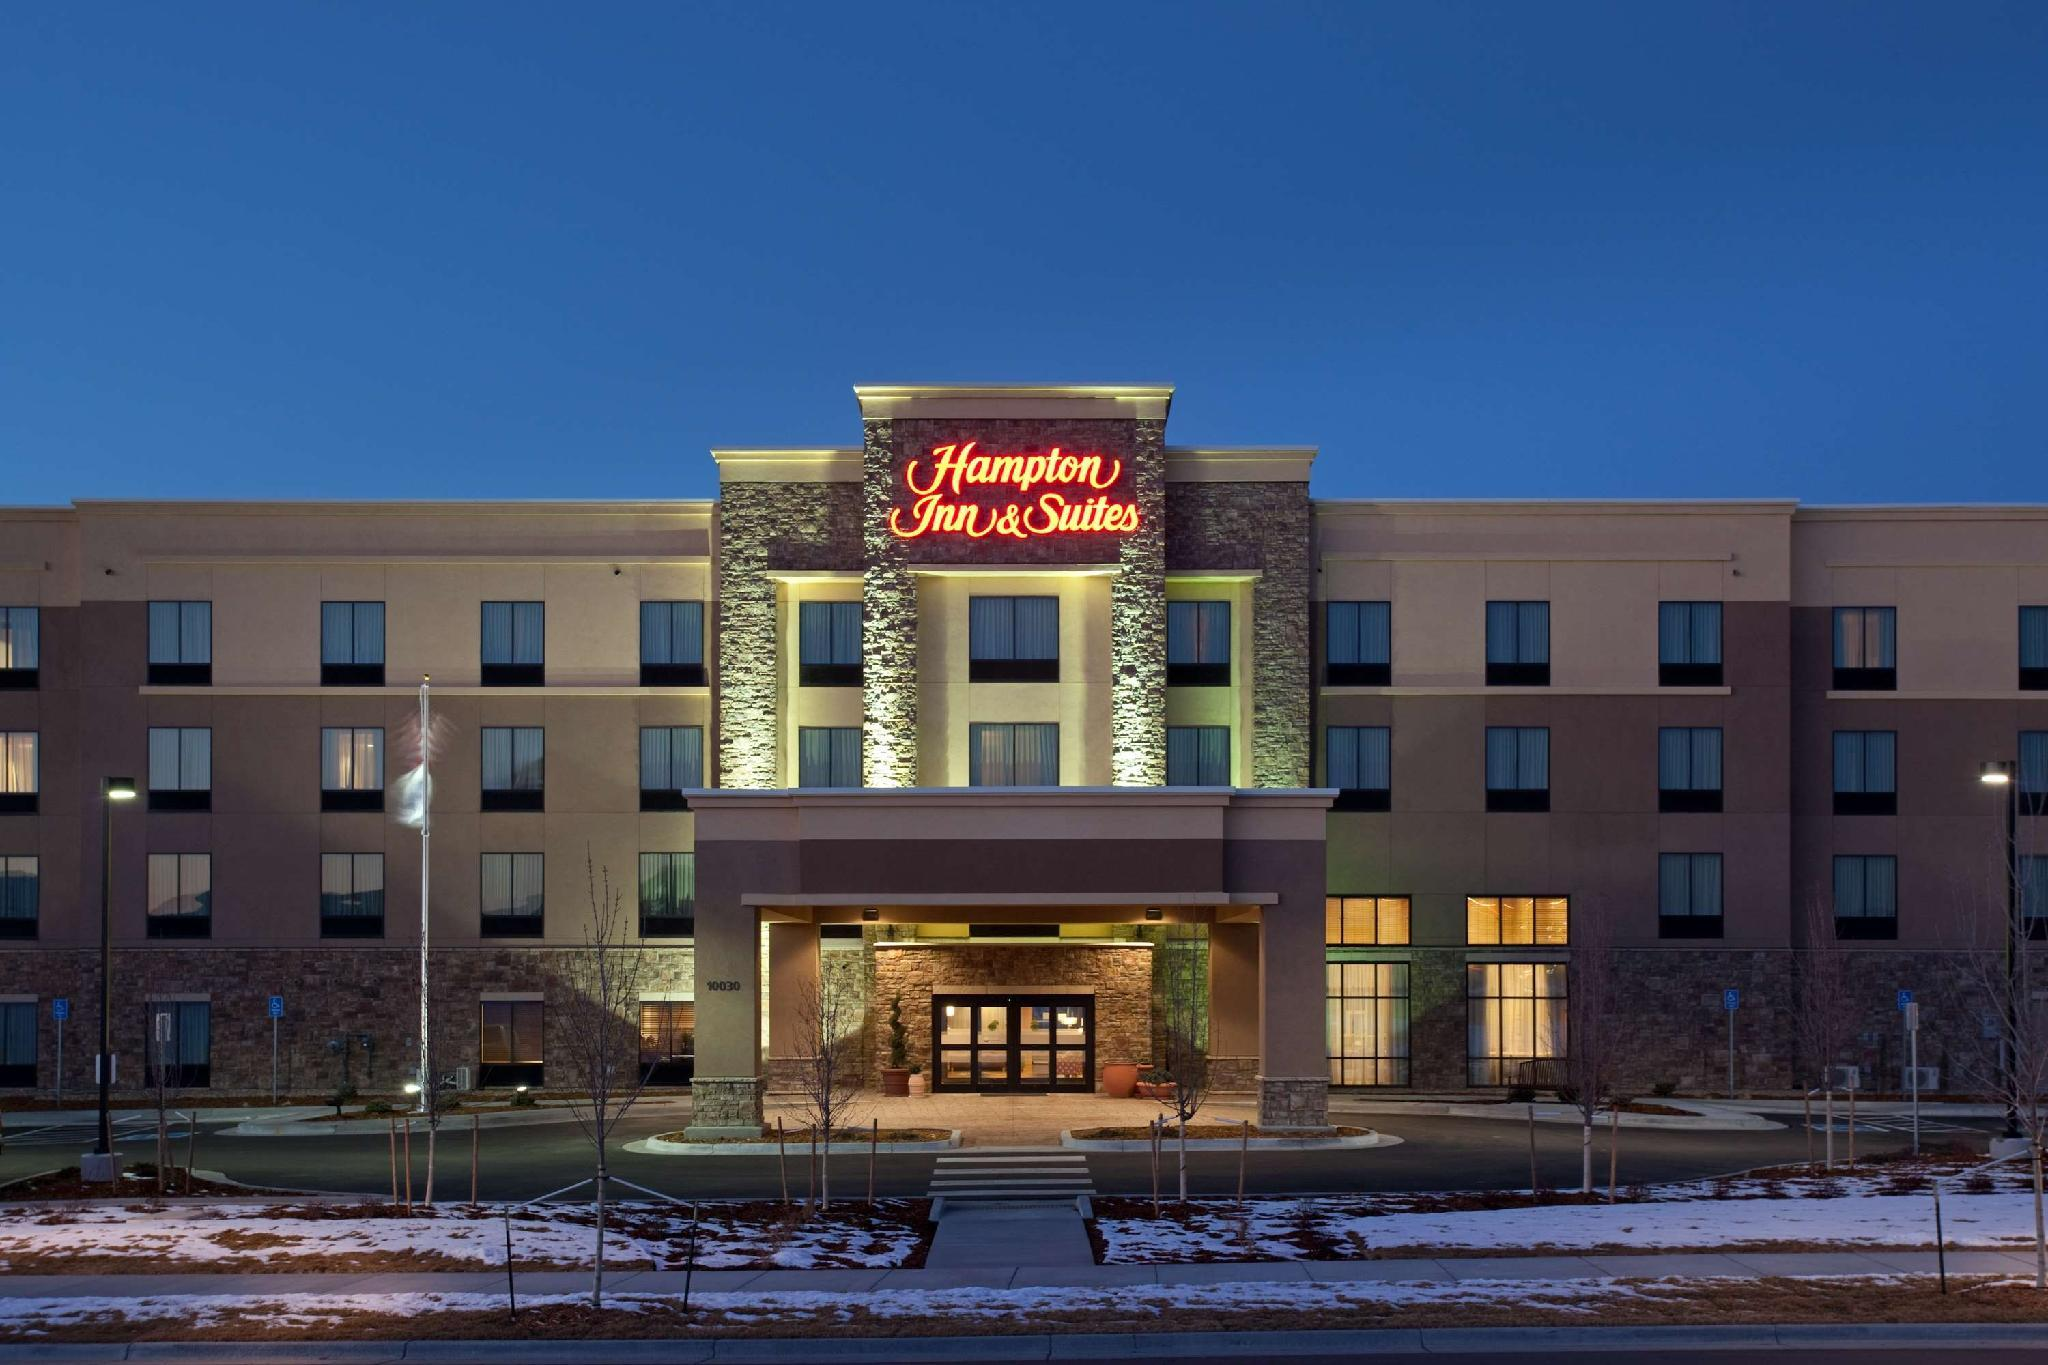 Hampton Inn And Suites Denver South Ridgegate